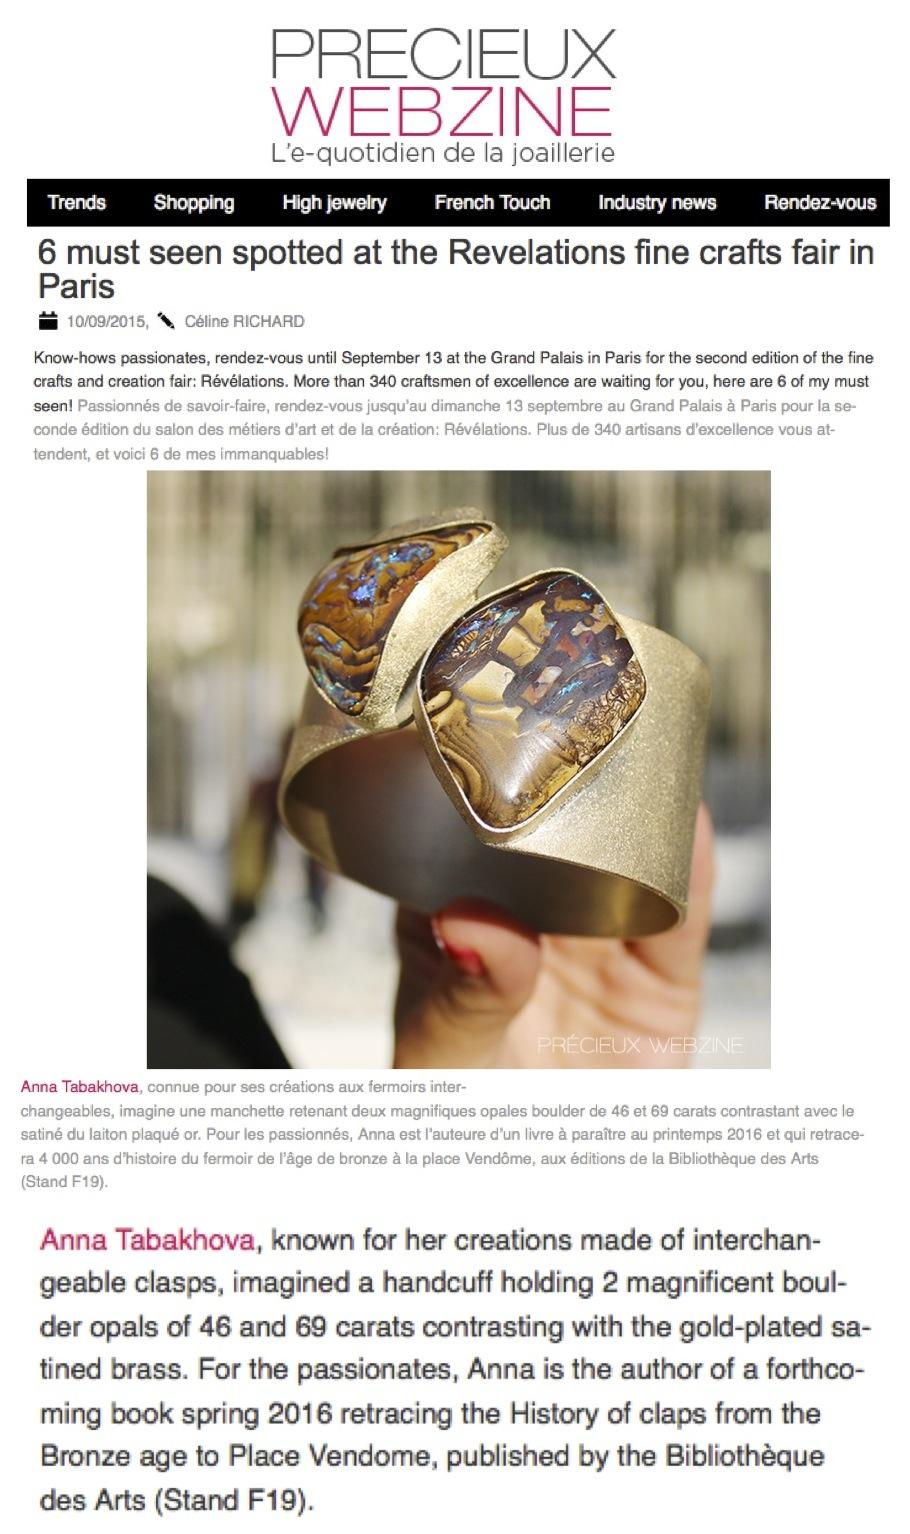 Precieux webzine presse manchette deux opales anna tabakhova bijoux, Paris